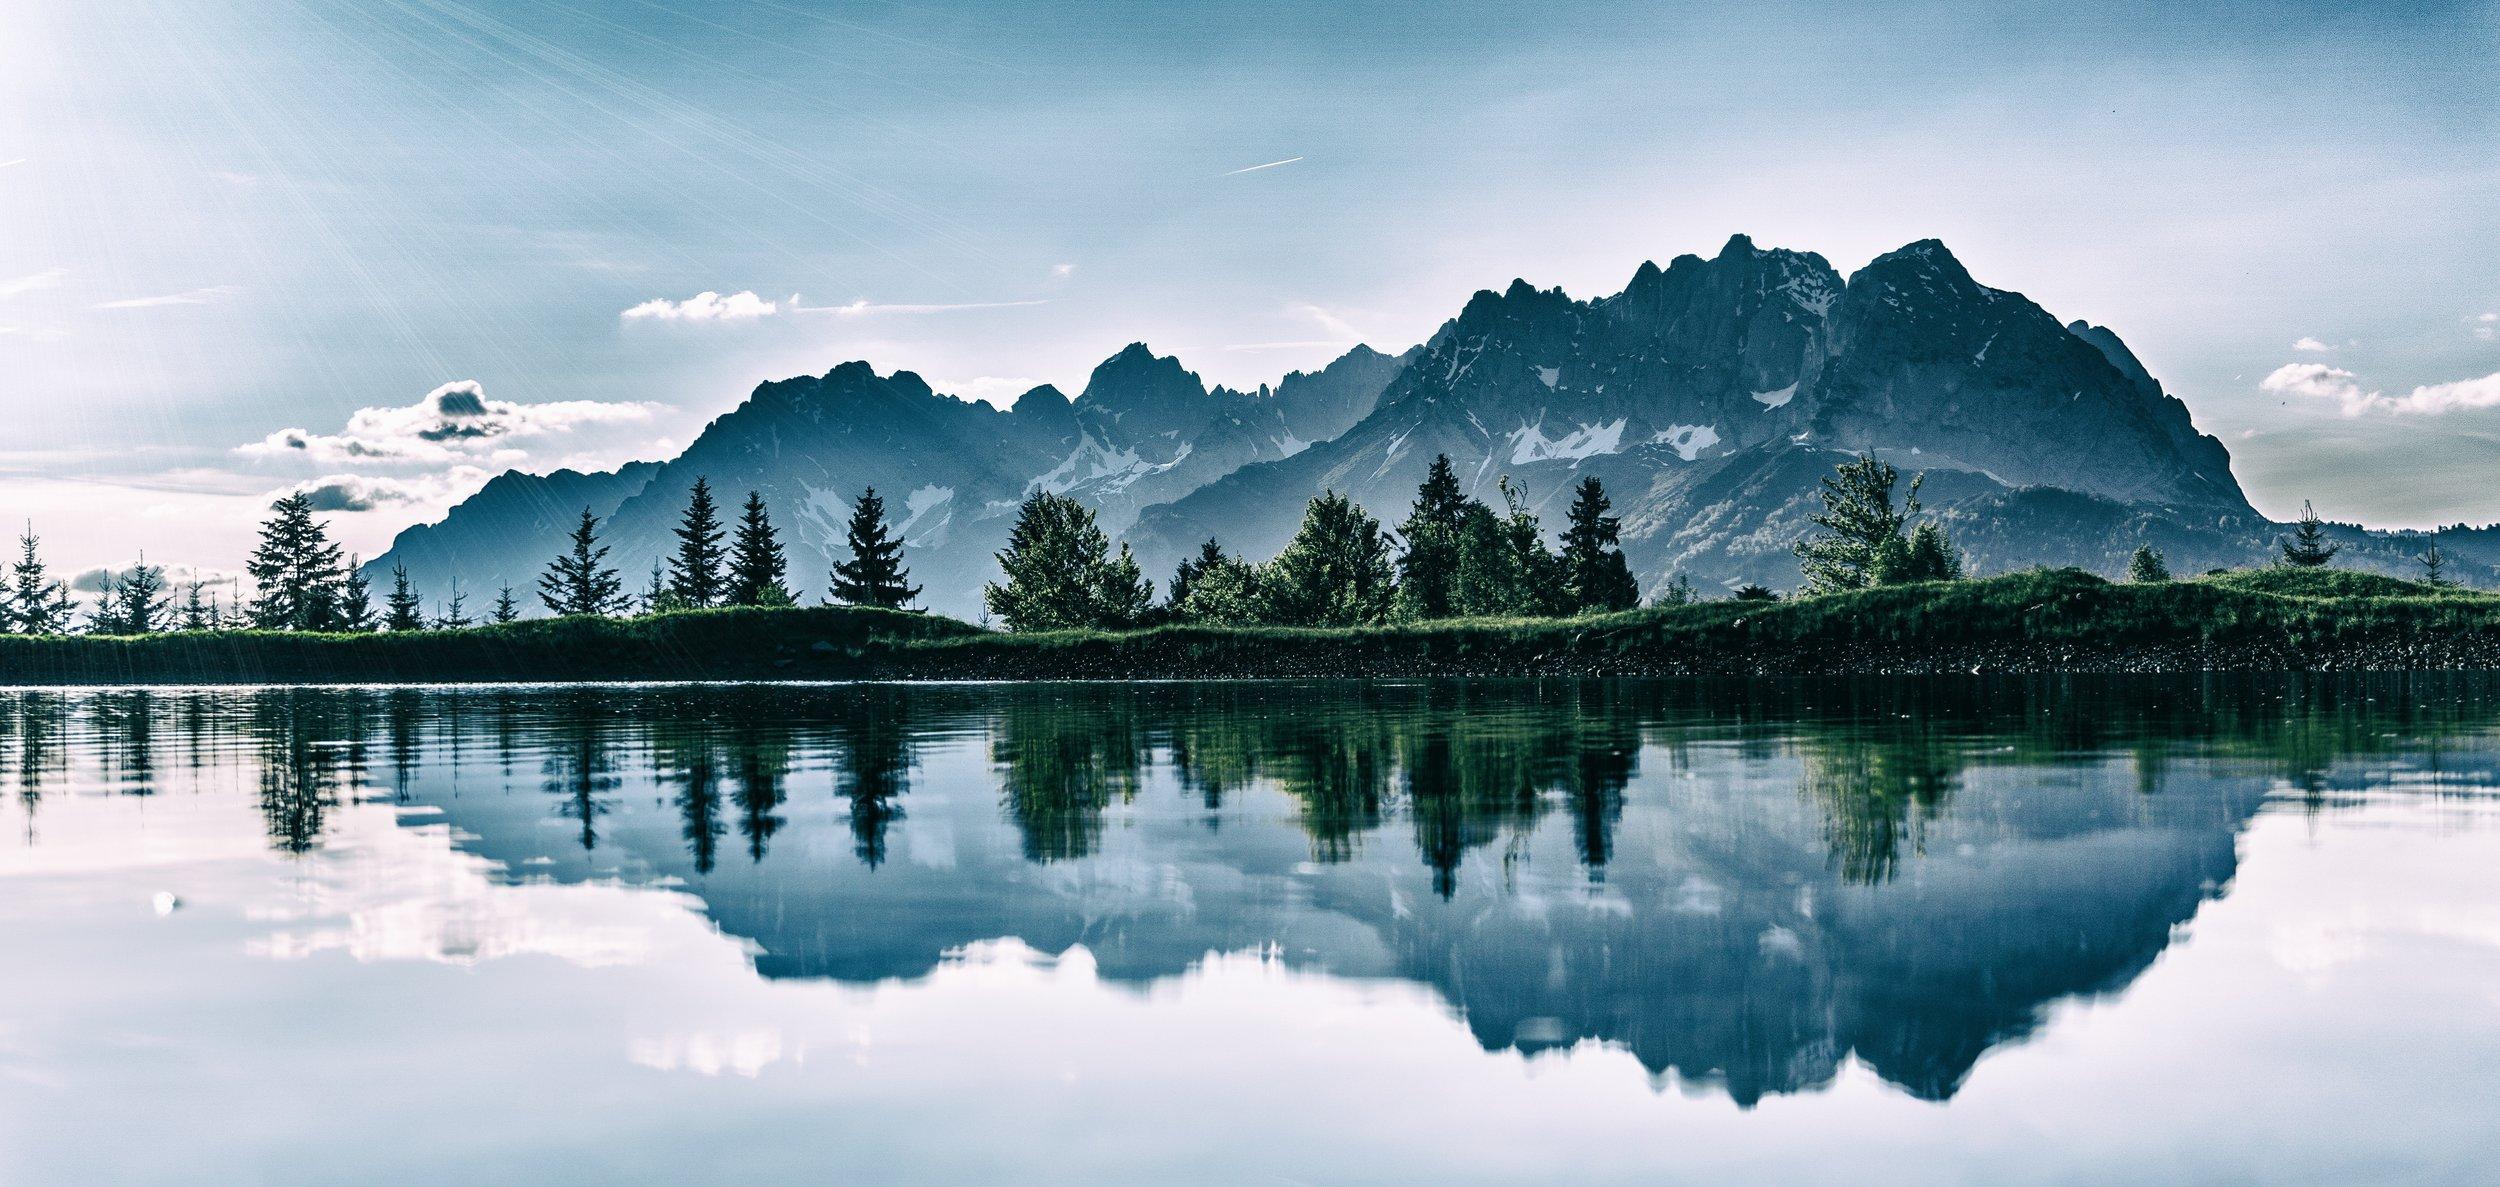 daylight-environment-forest-459225.jpg